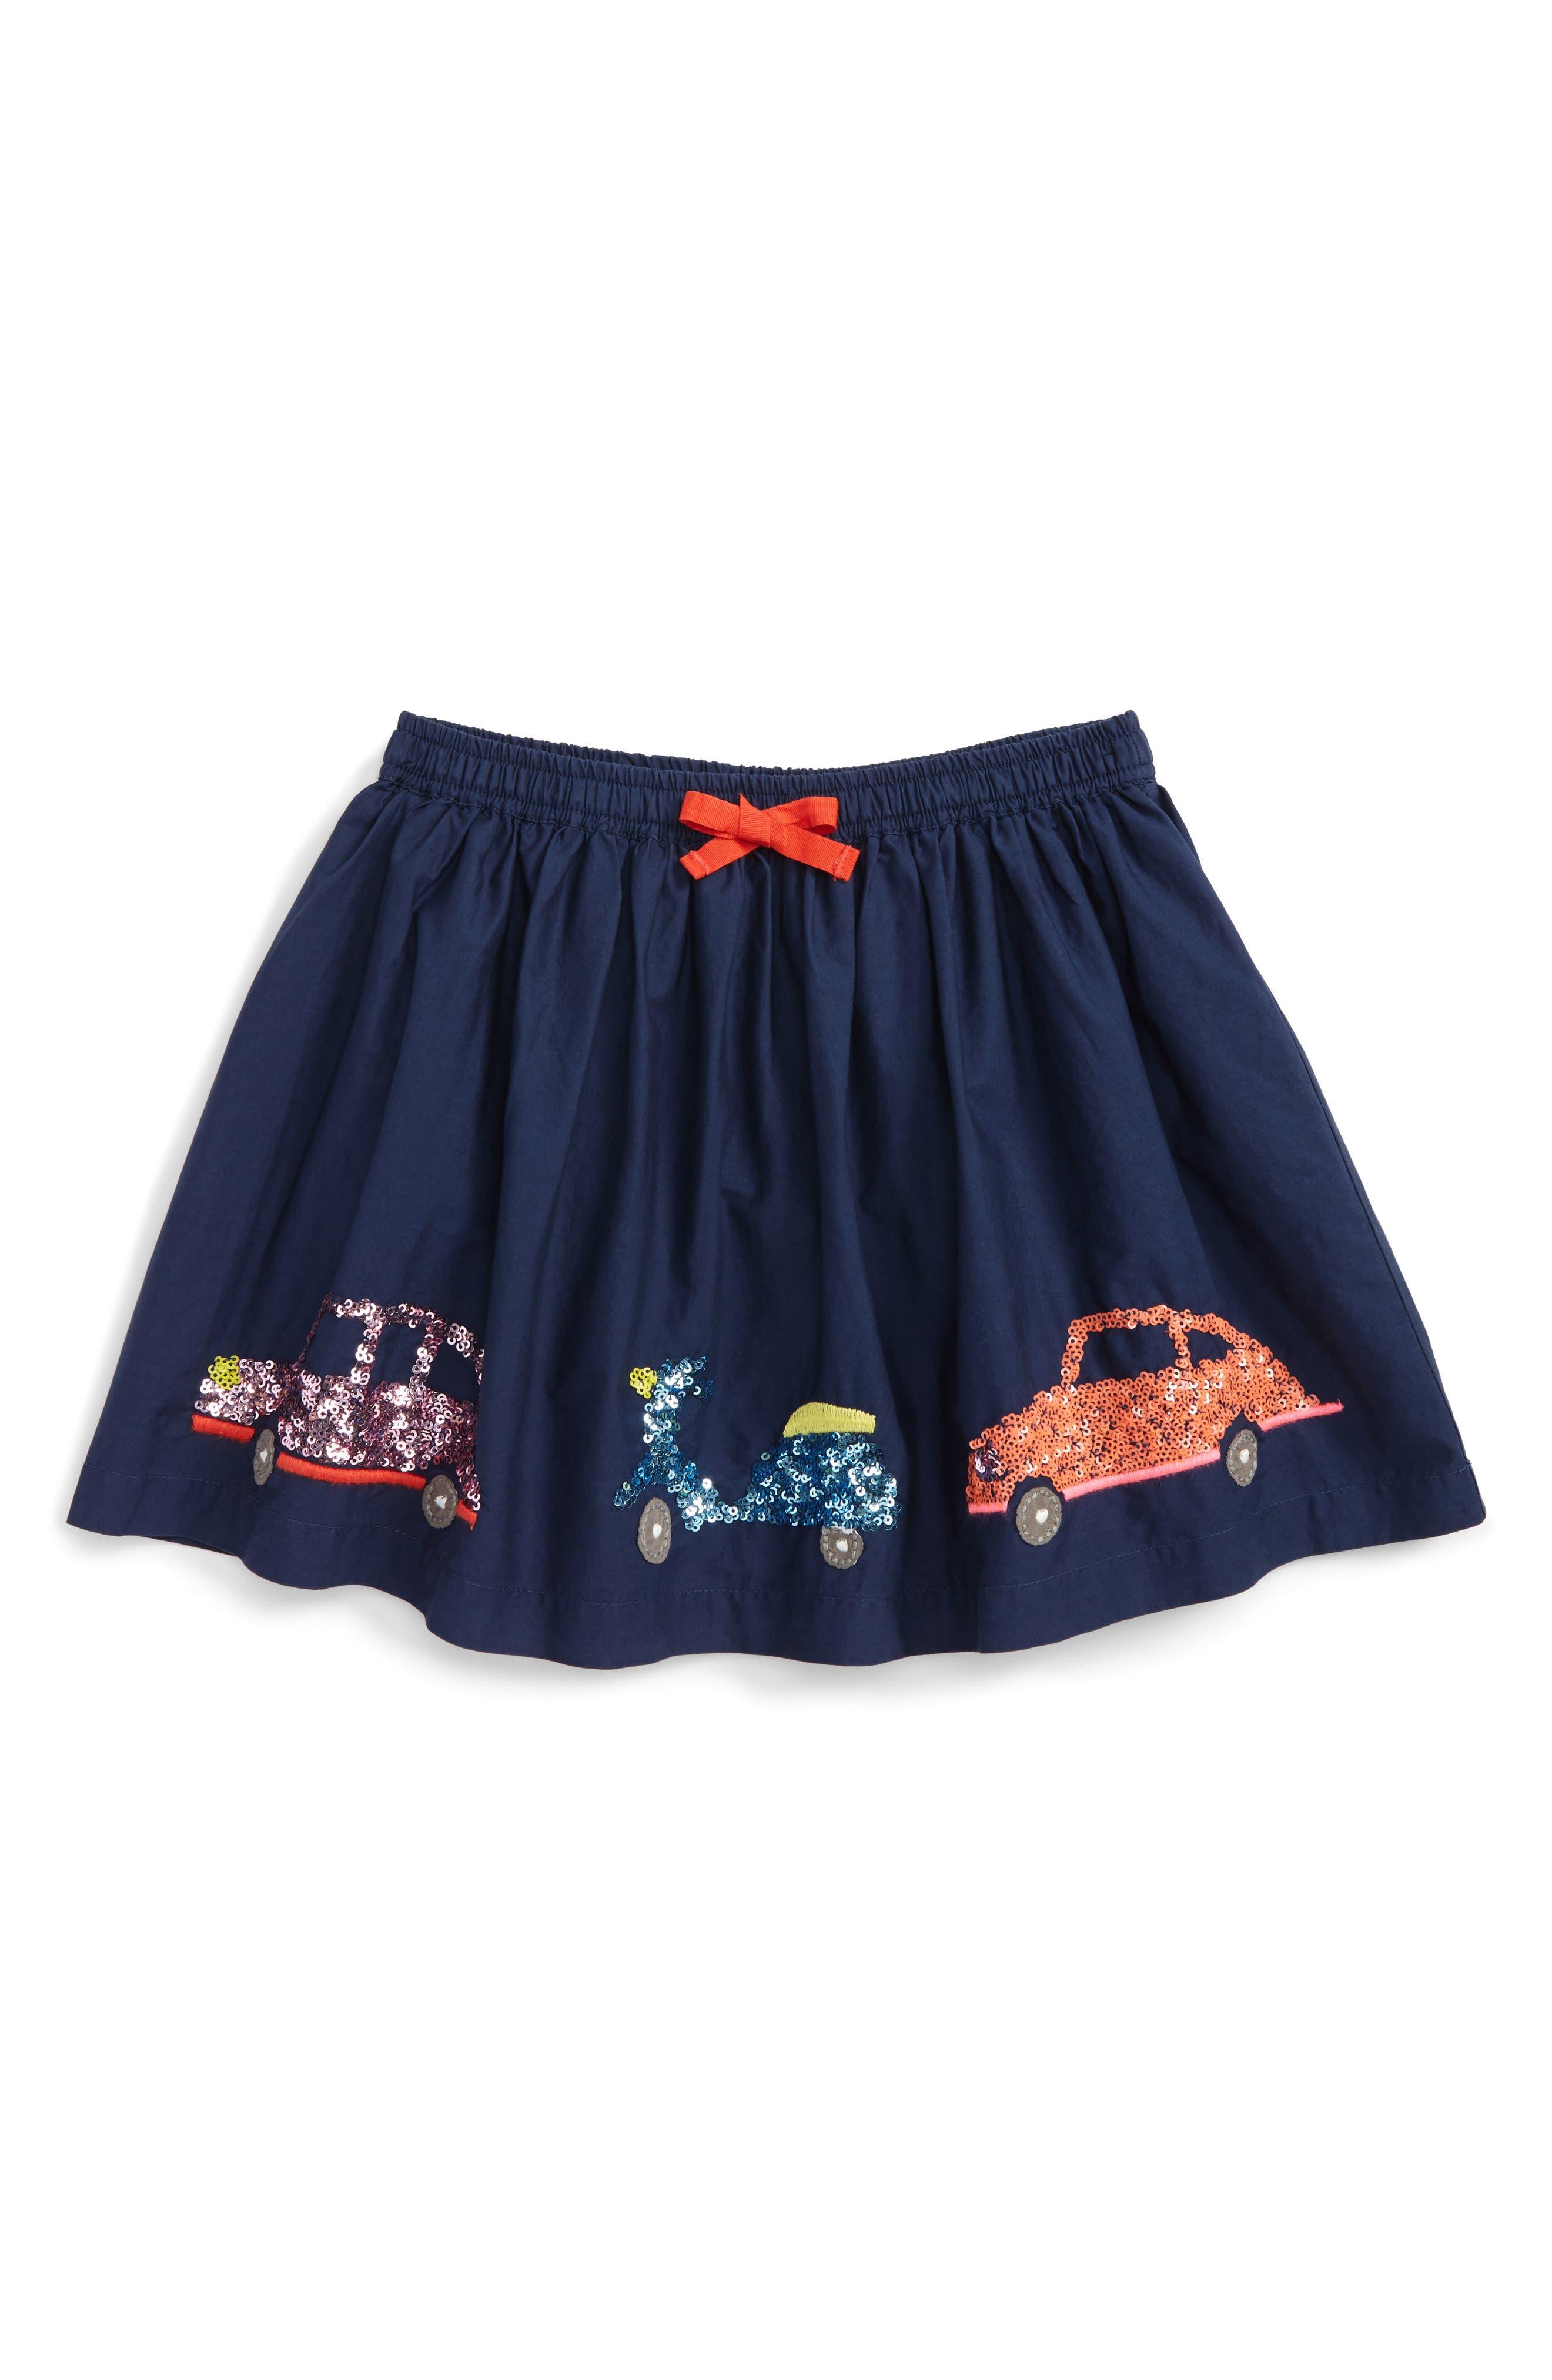 MINI BODEN Adventure Sequin Skirt